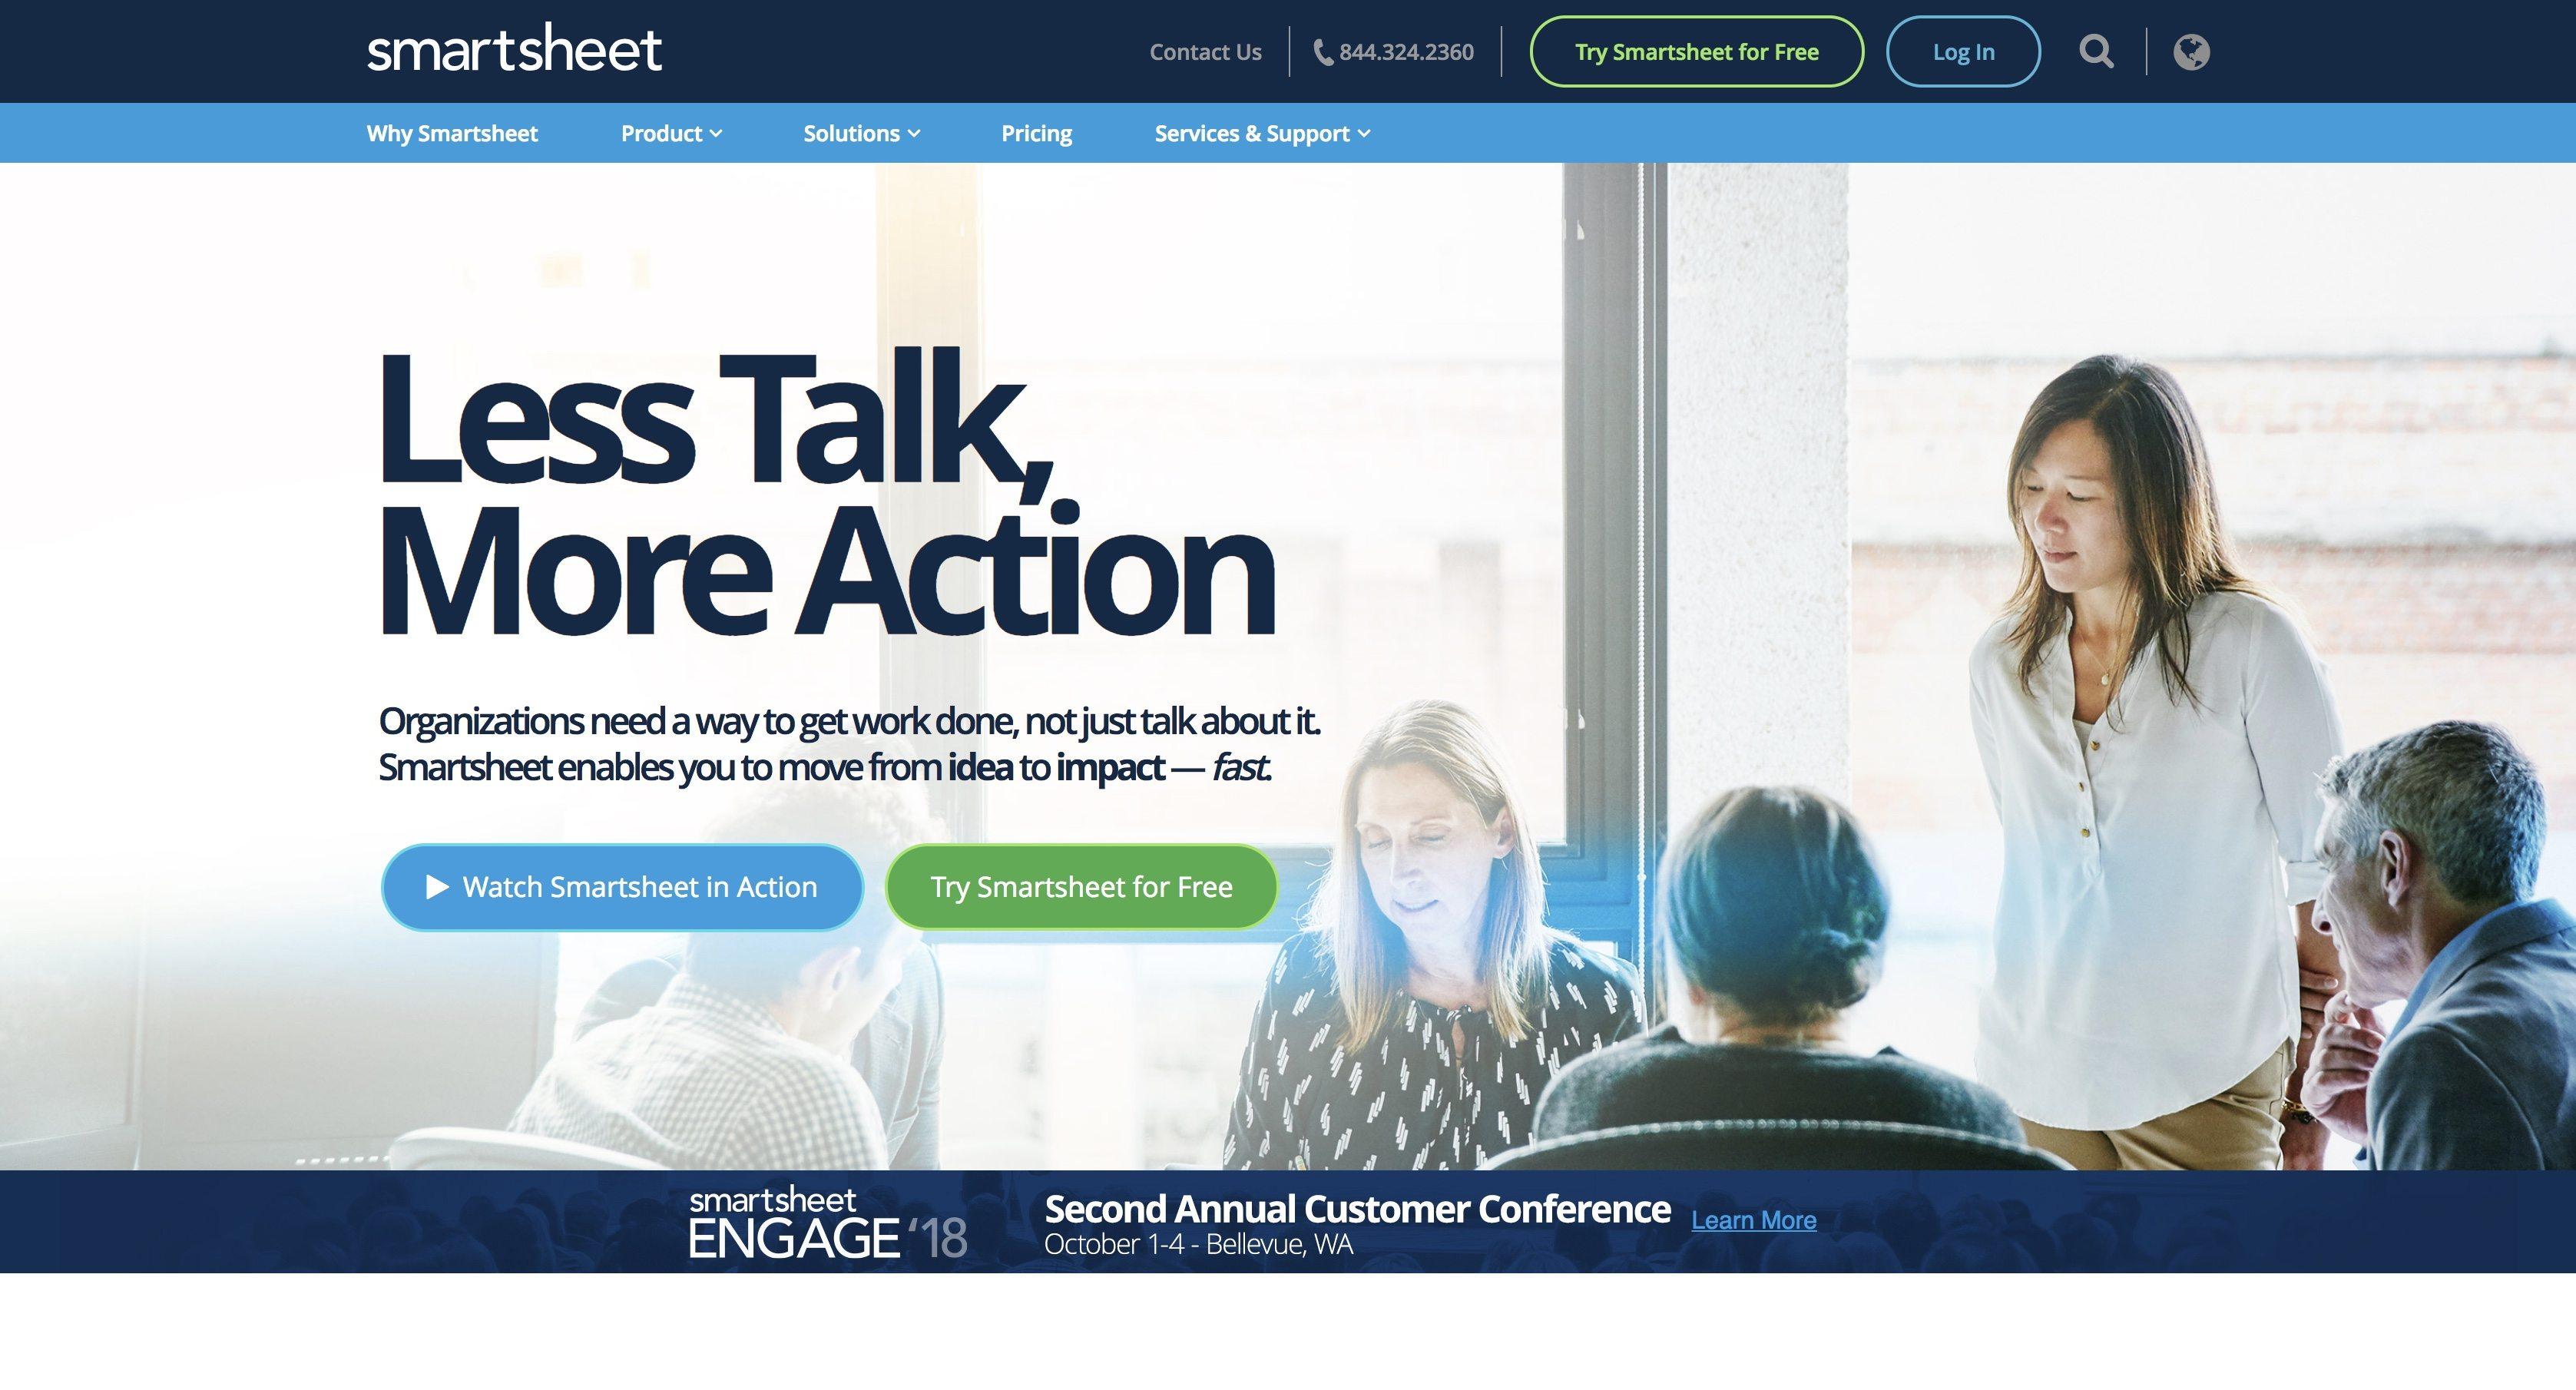 project planning apps smartsheet